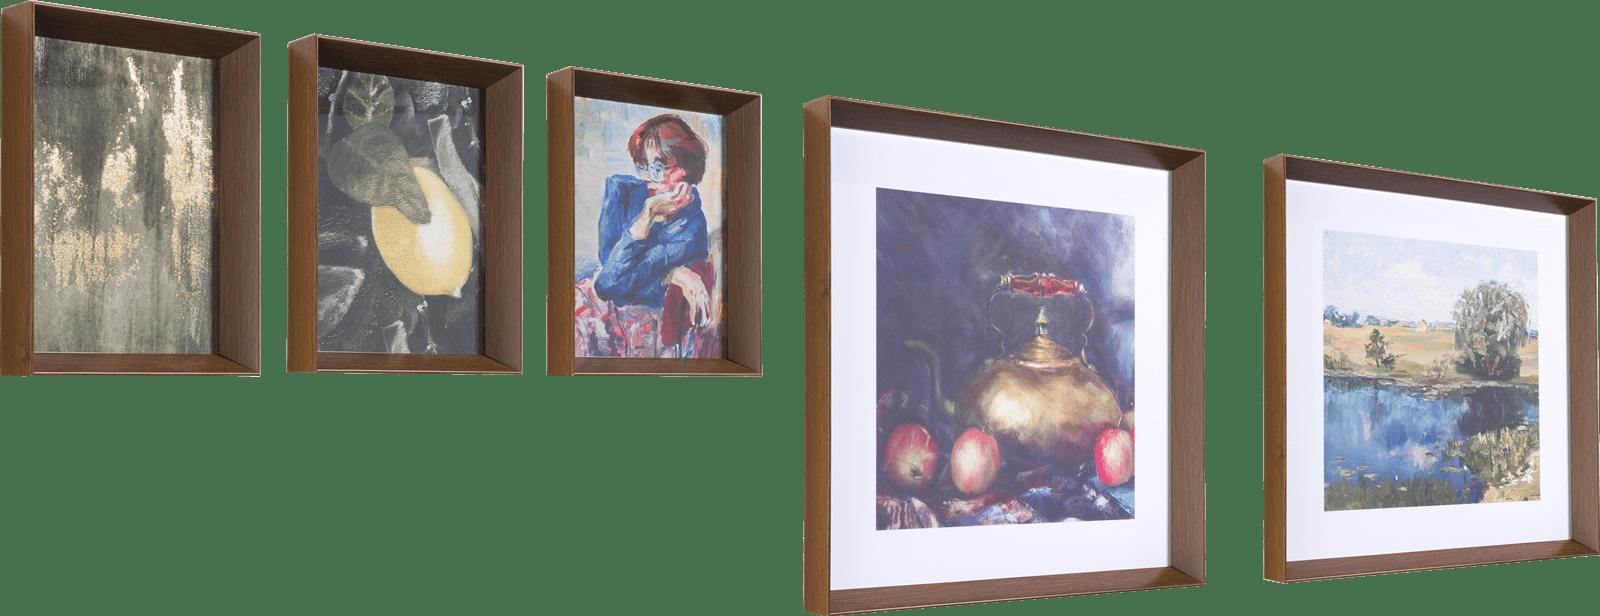 Happy@Home - Coco Maison - impressions set van 5 schilderijen